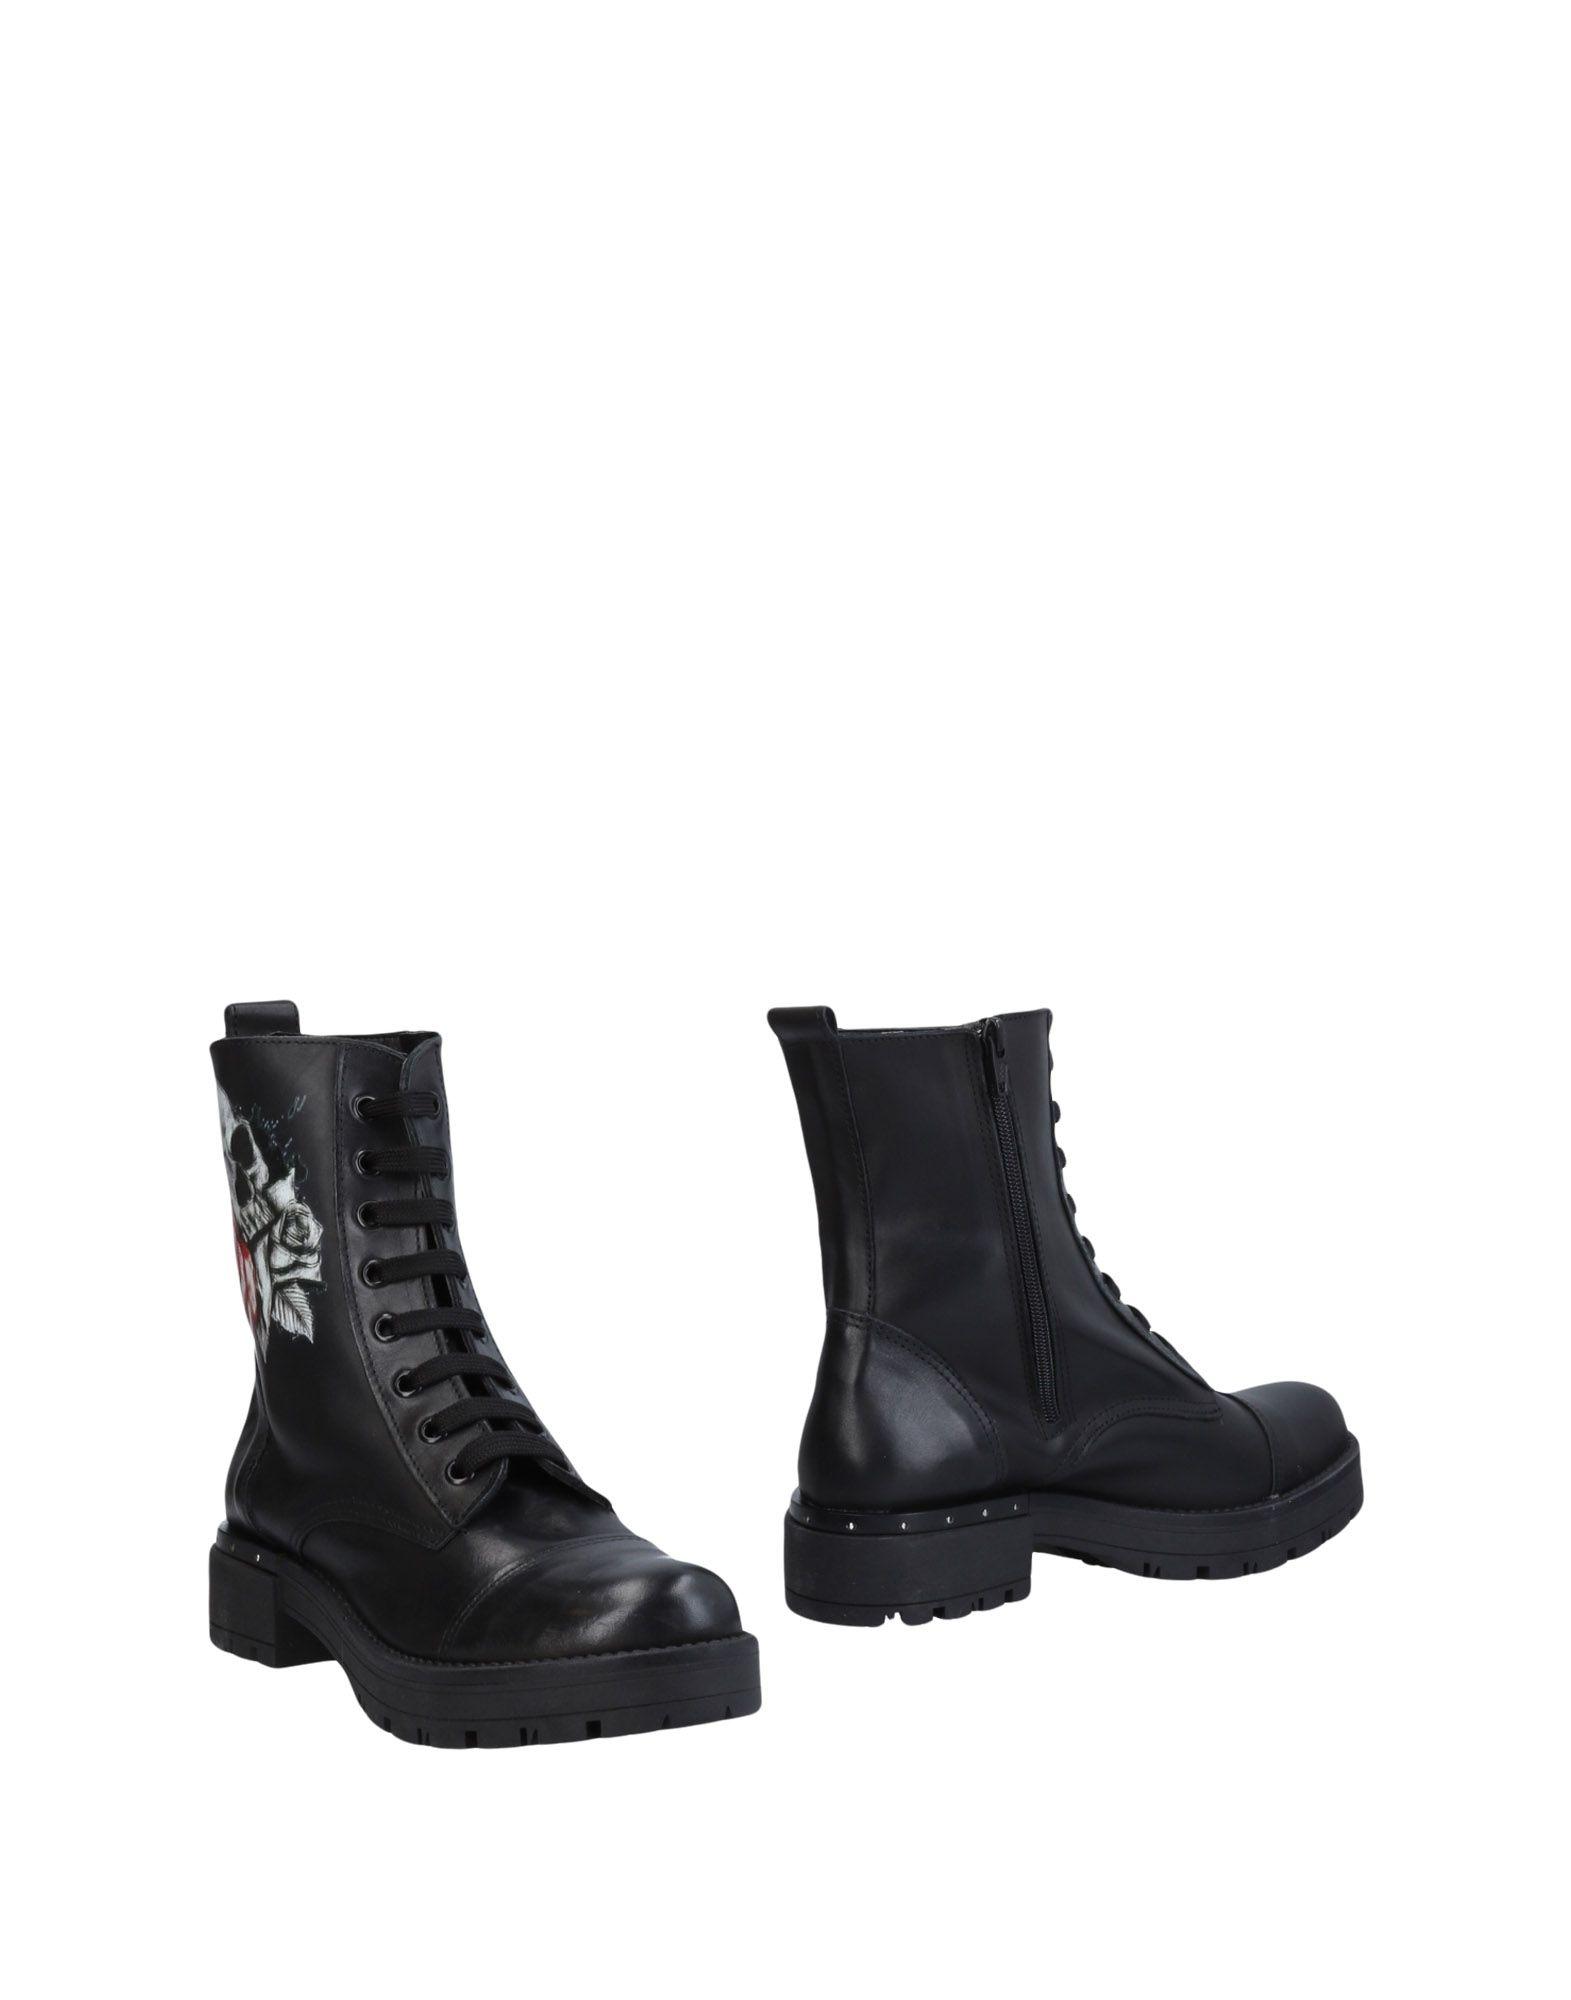 Charme Stiefelette Damen  11454842TW Heiße Schuhe Schuhe Heiße 186d04